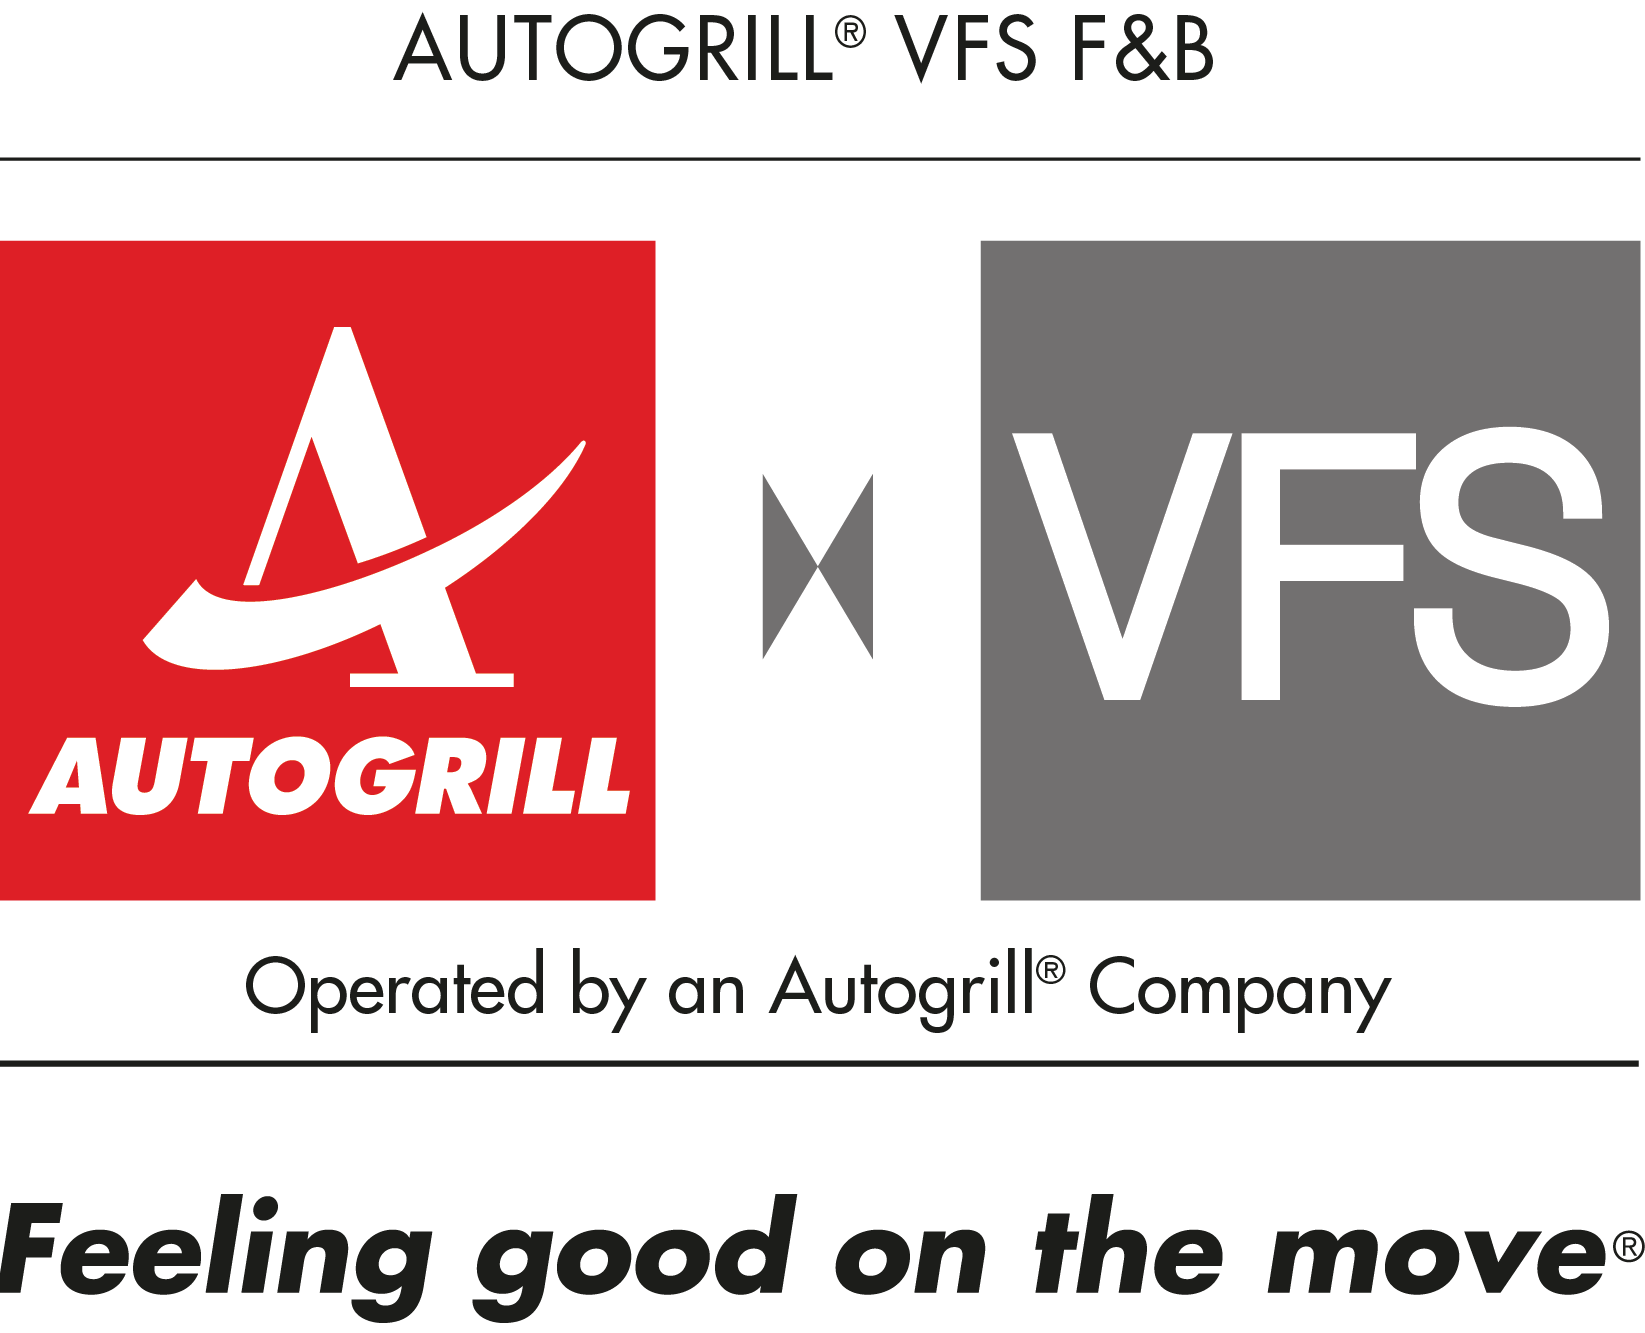 Công Ty TNHH AUTOGRILL VFS F&B